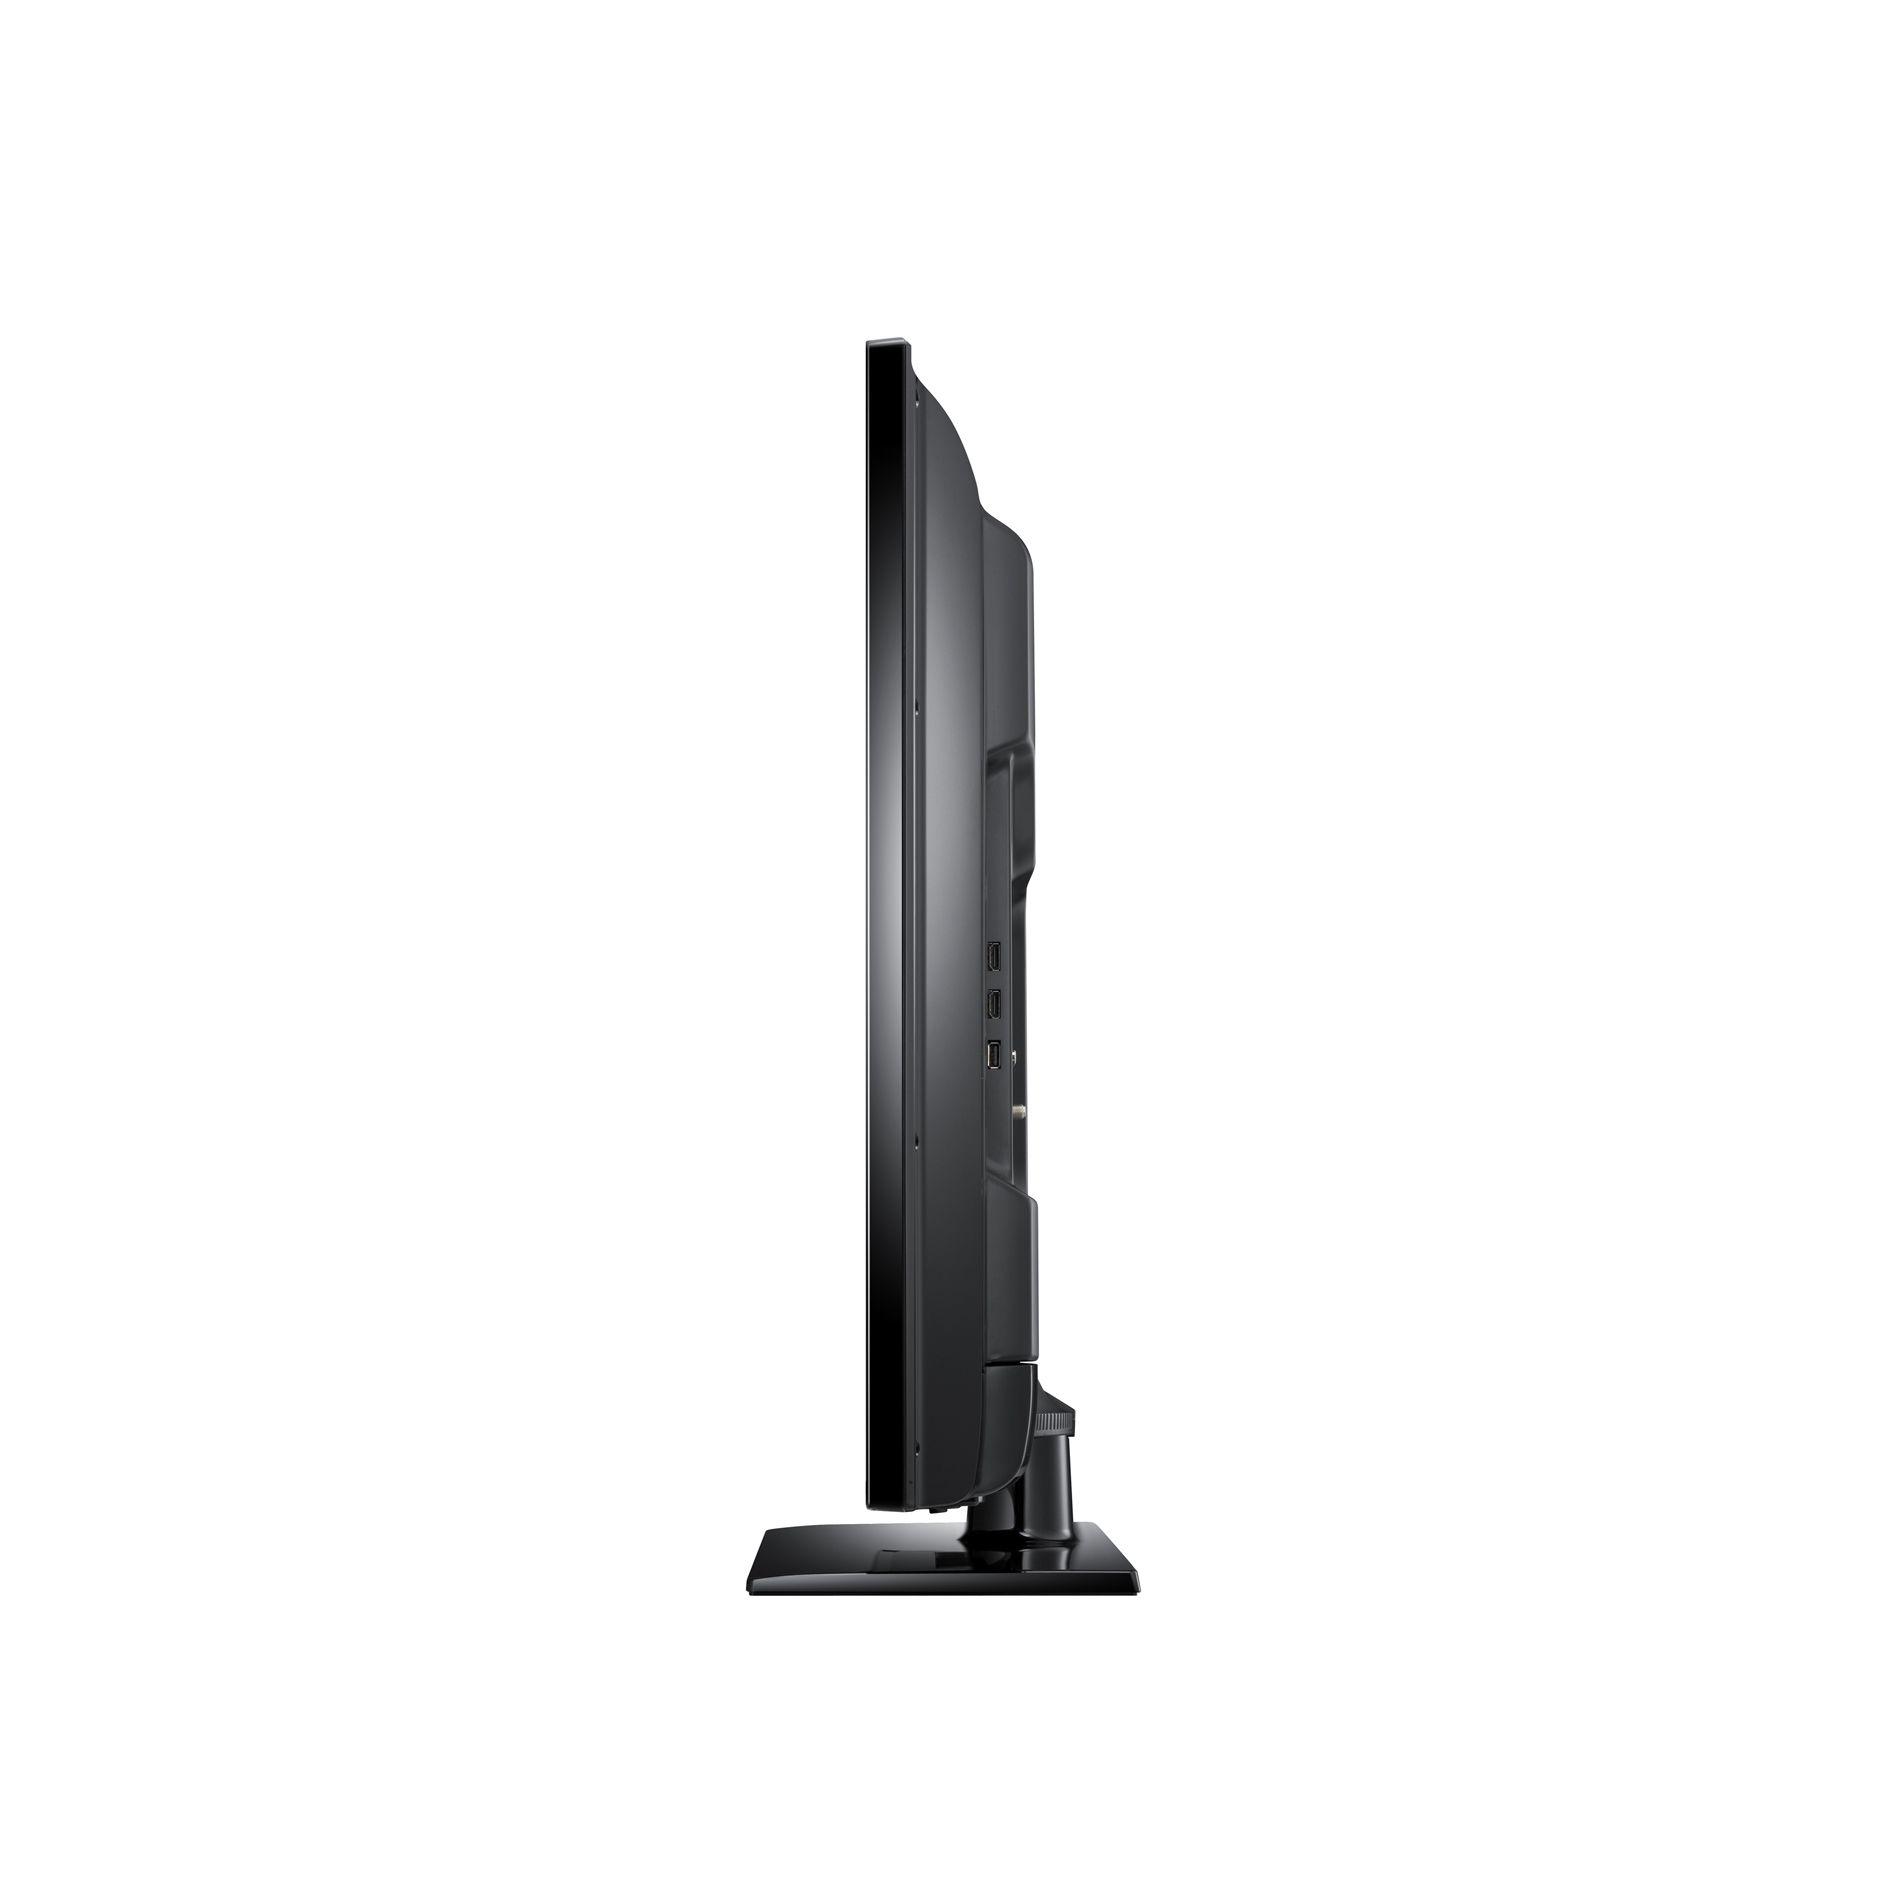 "Samsung 55"" Class 1080p 120Hz LED HDTV - UN55EH6000FXZA"